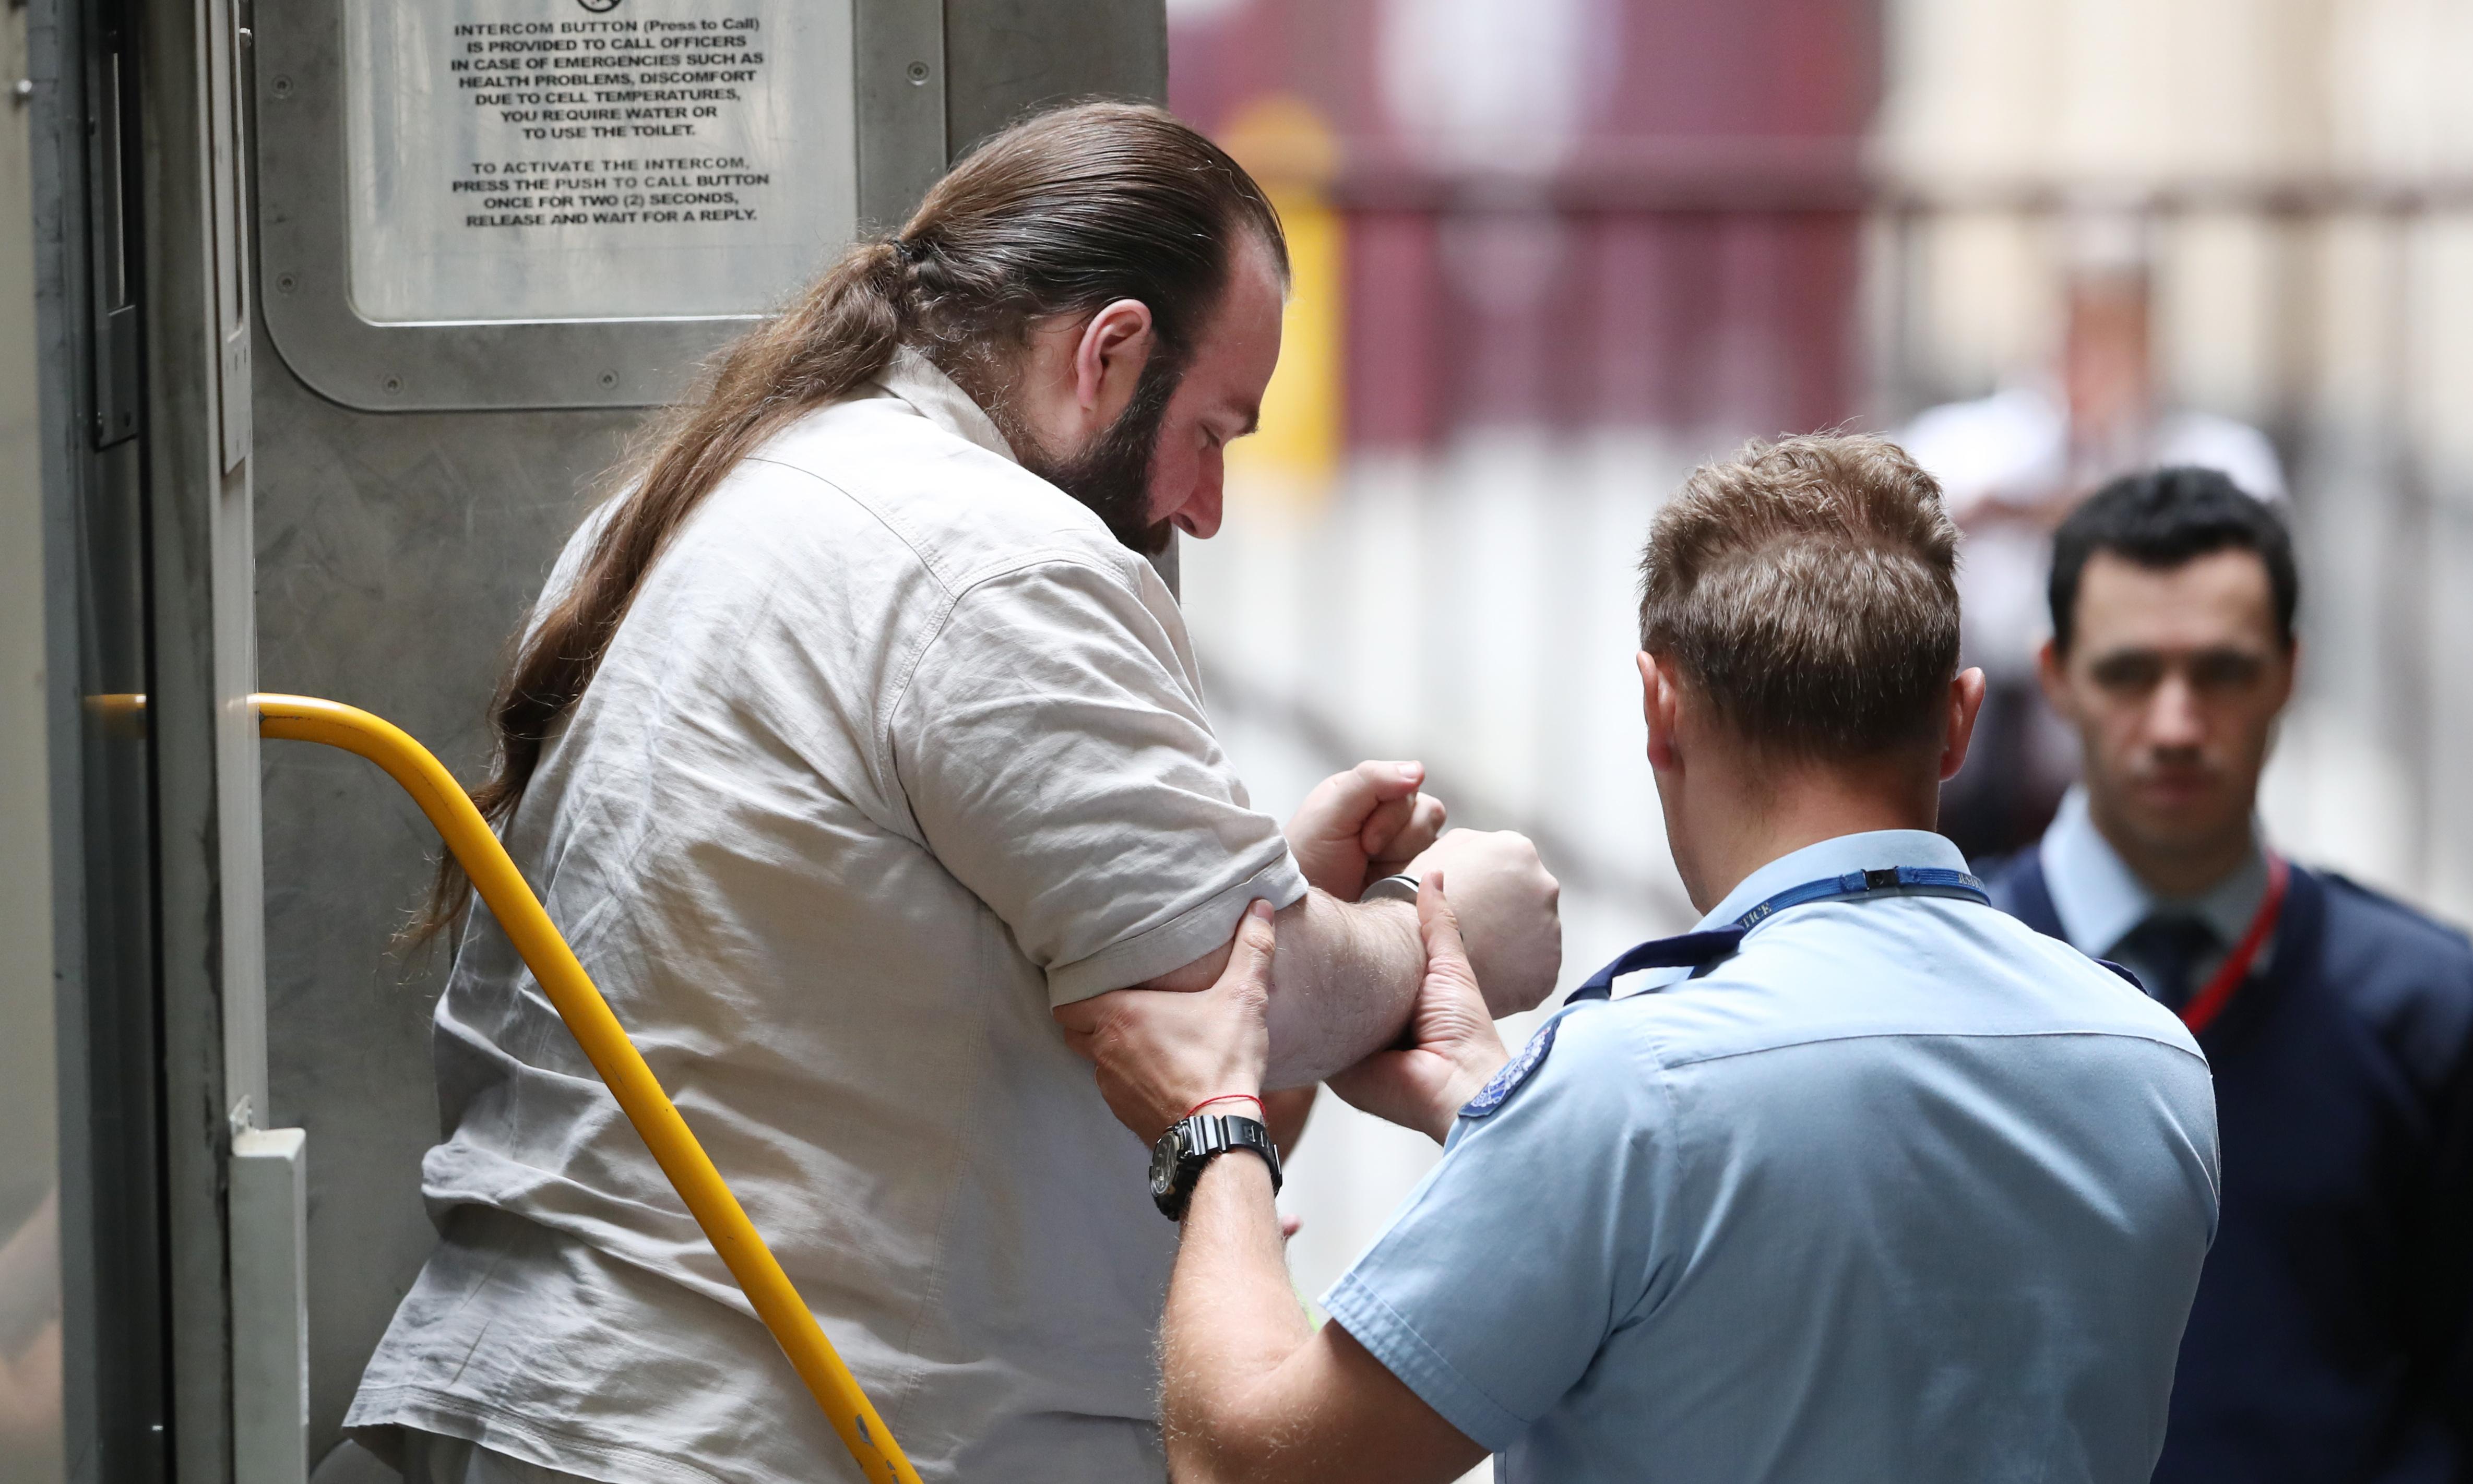 Accused far-right terrorist says how-to massacre document was 'satire'